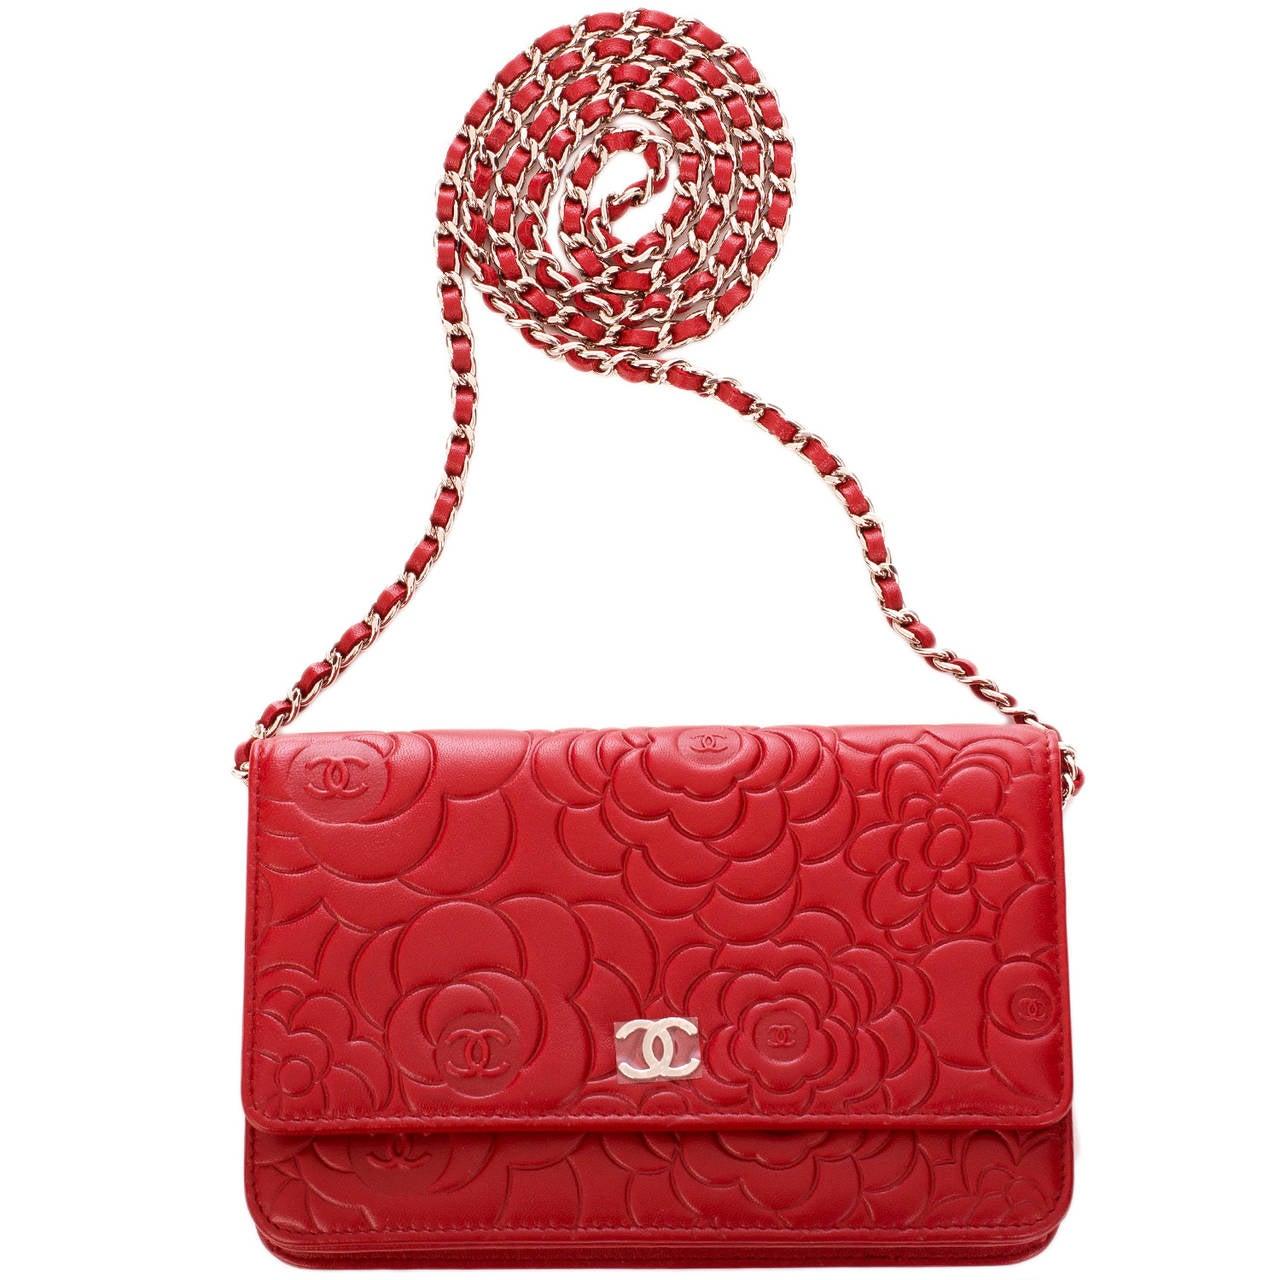 Chanel <u>lambskin</u> Red Lambskin